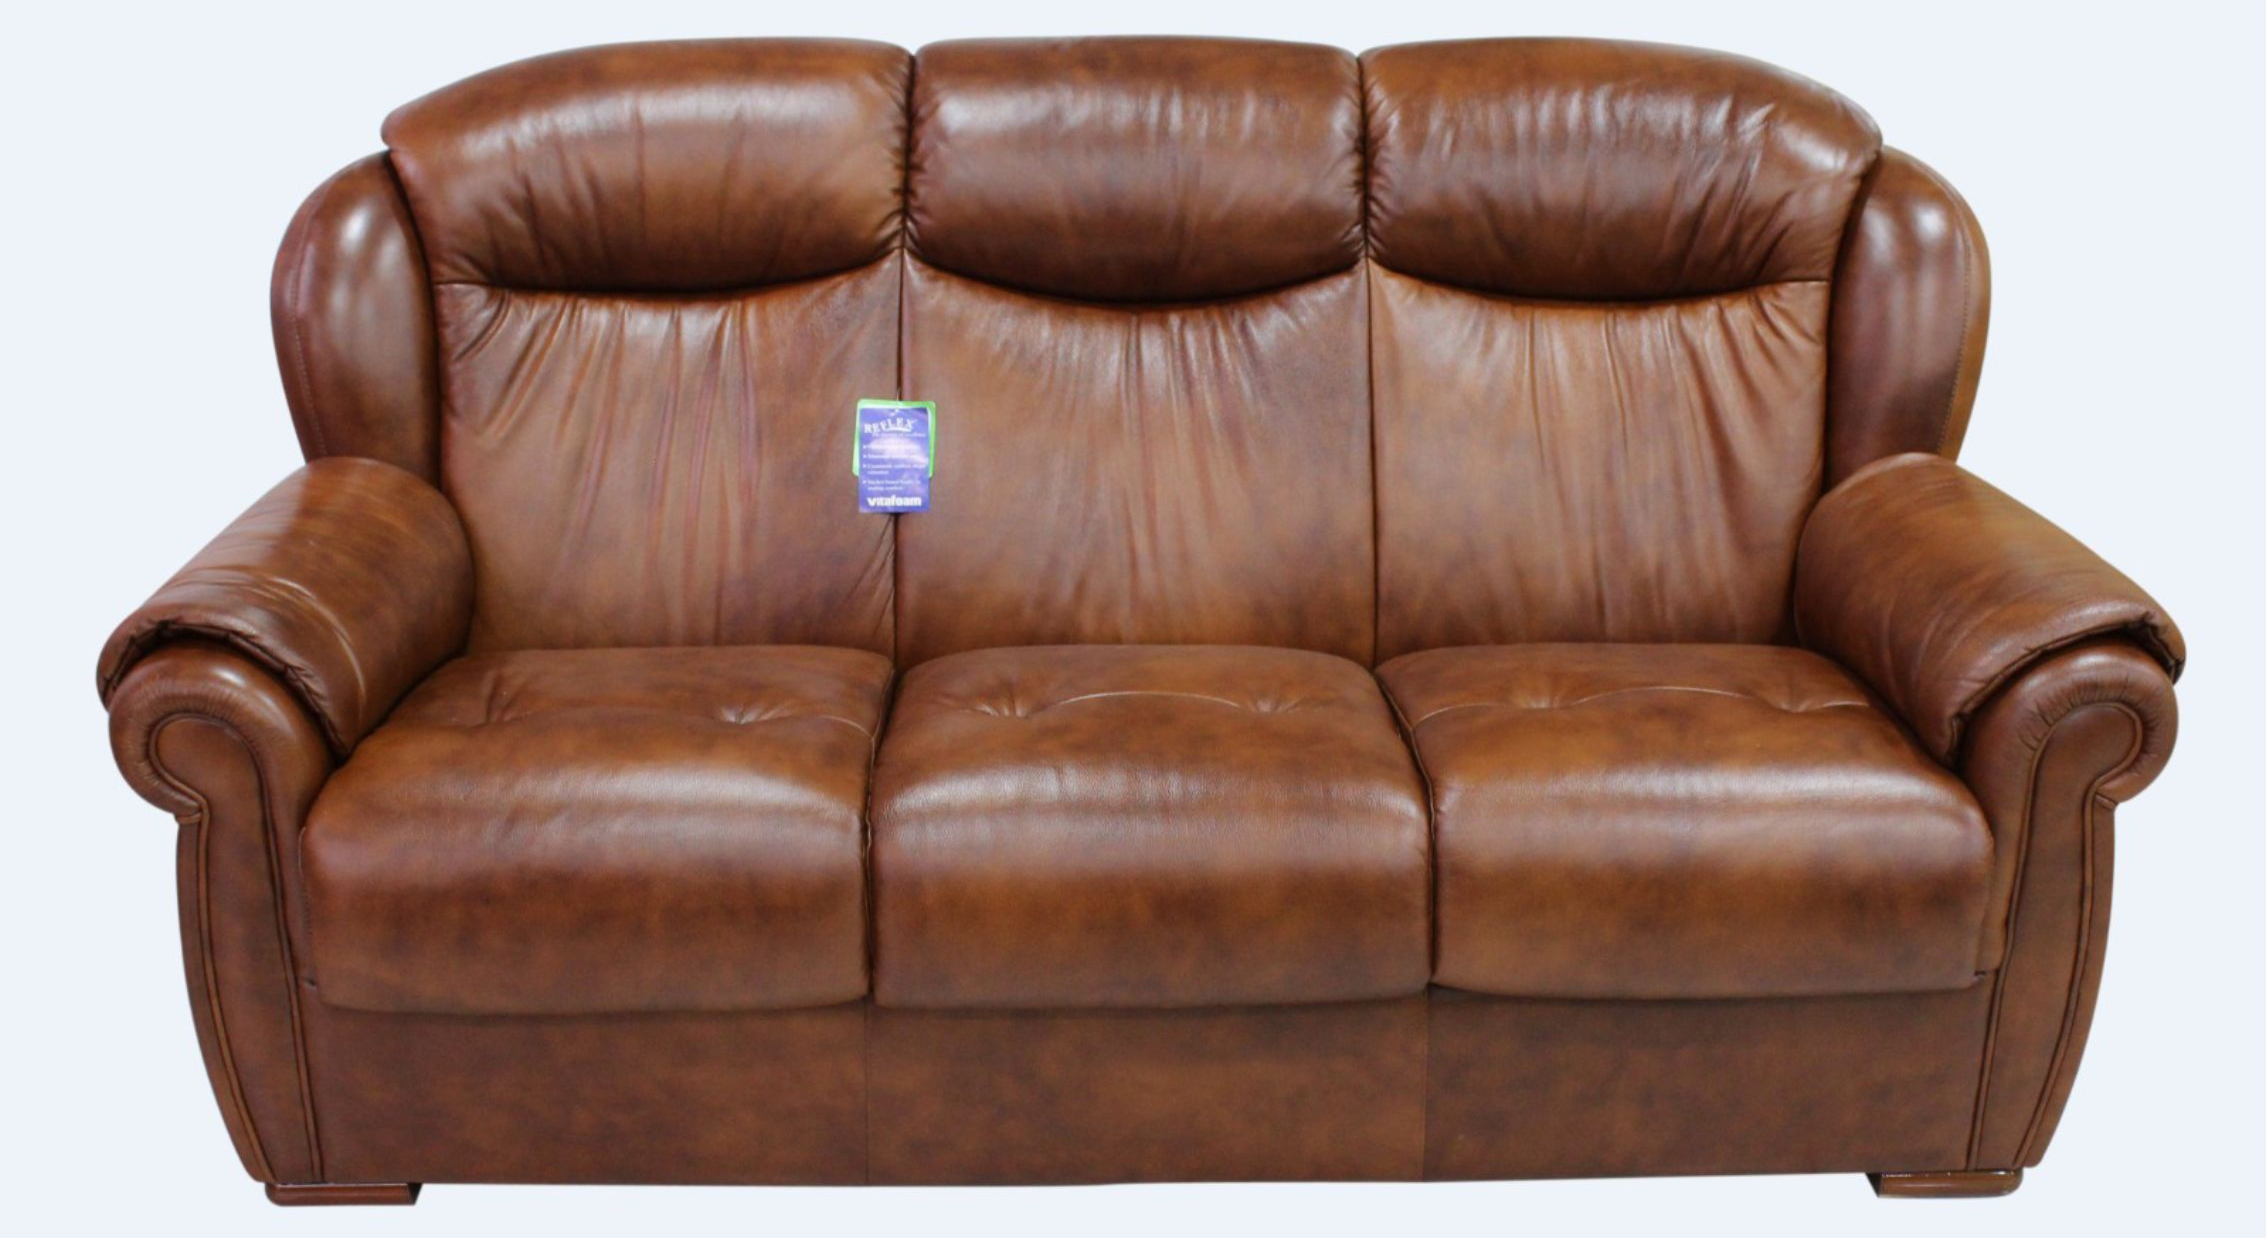 Palermo Genuine Italian Leather 3 Seater Sofa Settee Tabak